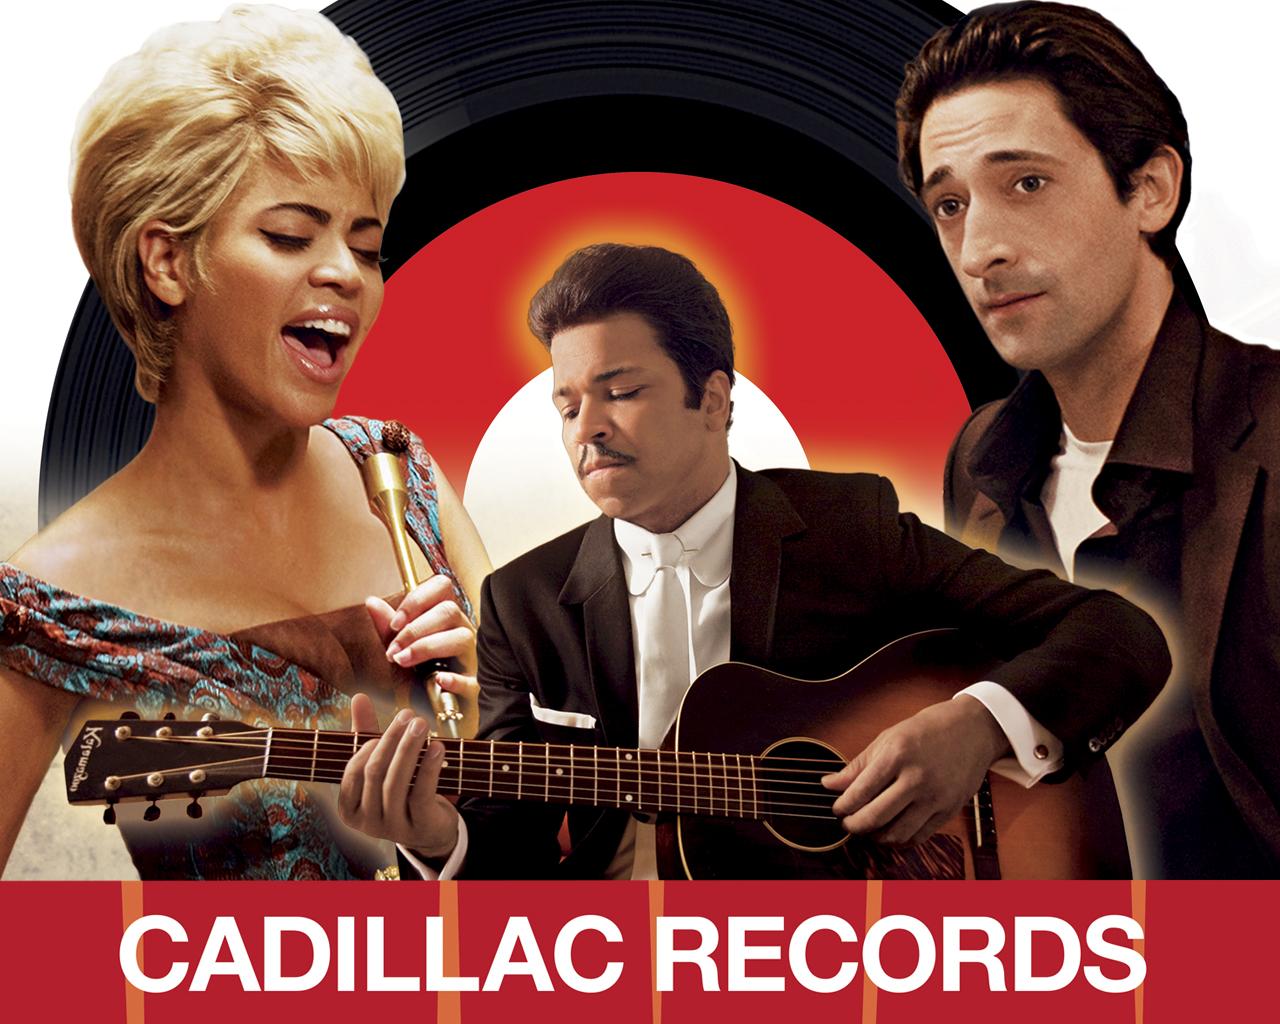 Filmes Sobre Musicos for moviemusiconnection: cadillac records: grandes histórias de